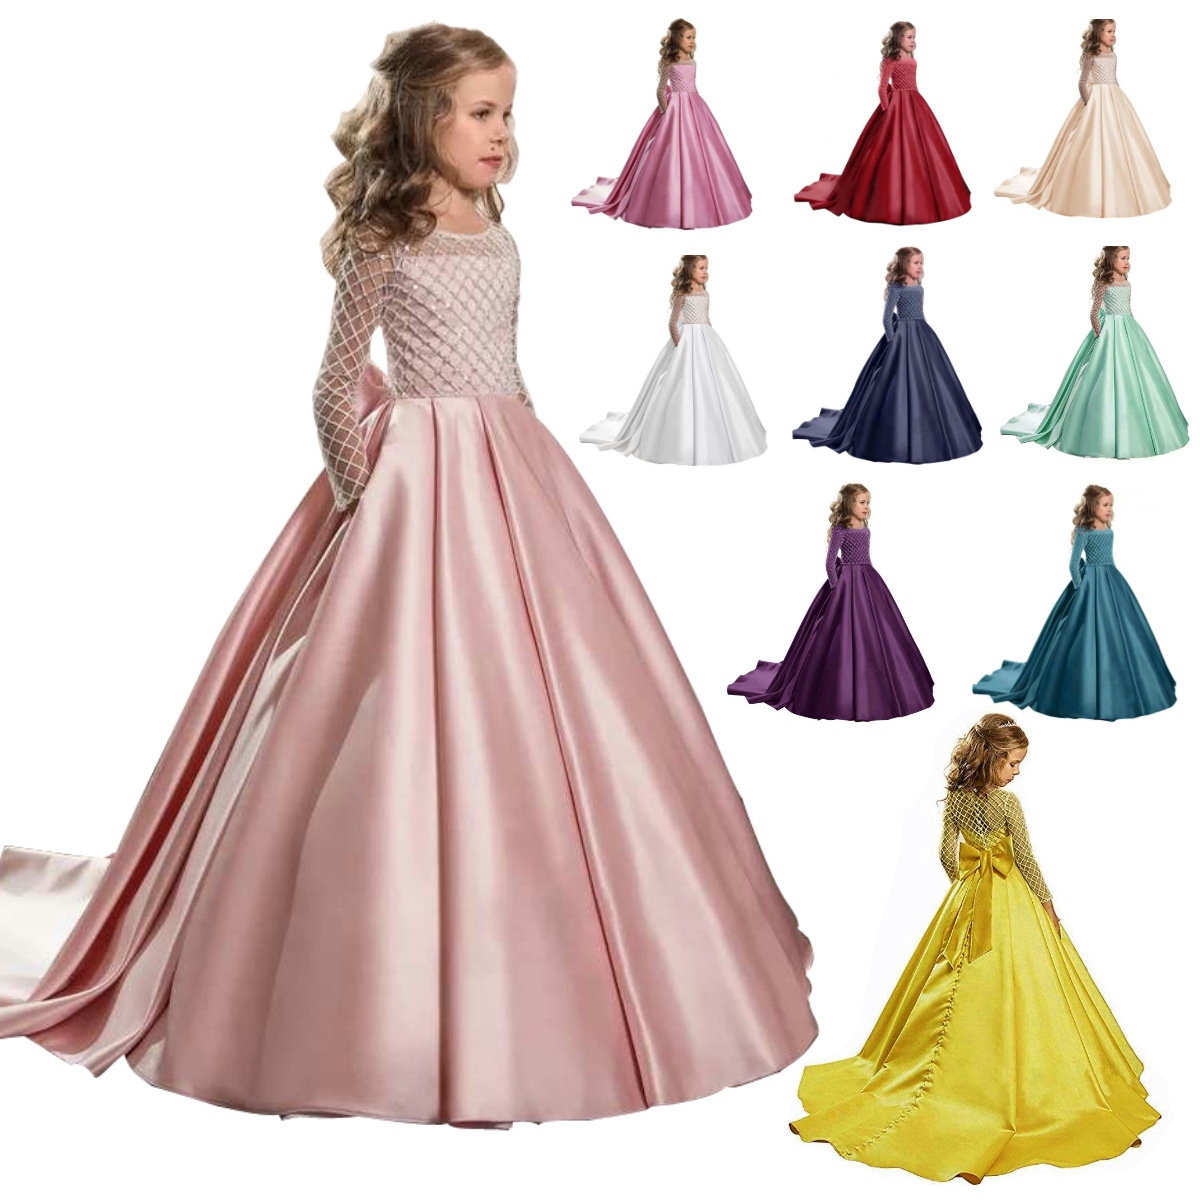 New Style Childrenswear CHILDREN'S Dress Girls Lace Satin Bow Small Tailing Flower Boys/Flower Girls Princess Skirt